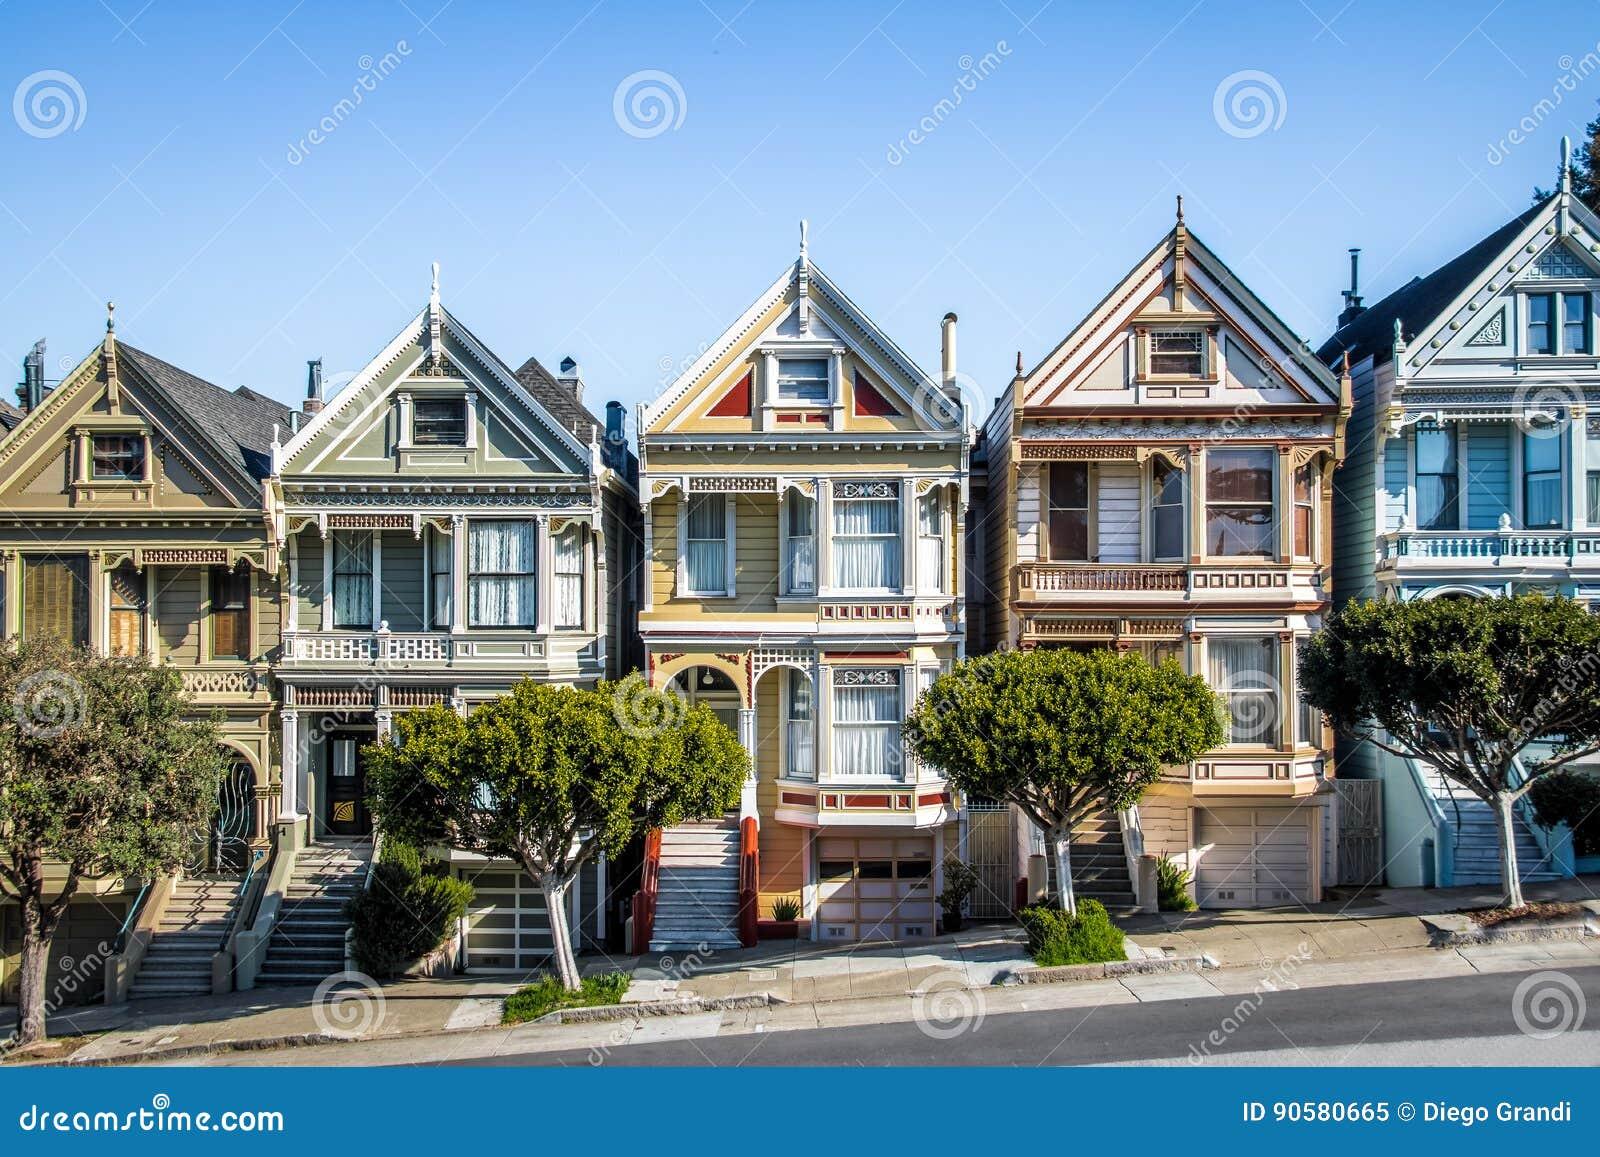 distelfalter viktorianische h user rudern an alamo quadrat san francisco kalifornien usa. Black Bedroom Furniture Sets. Home Design Ideas